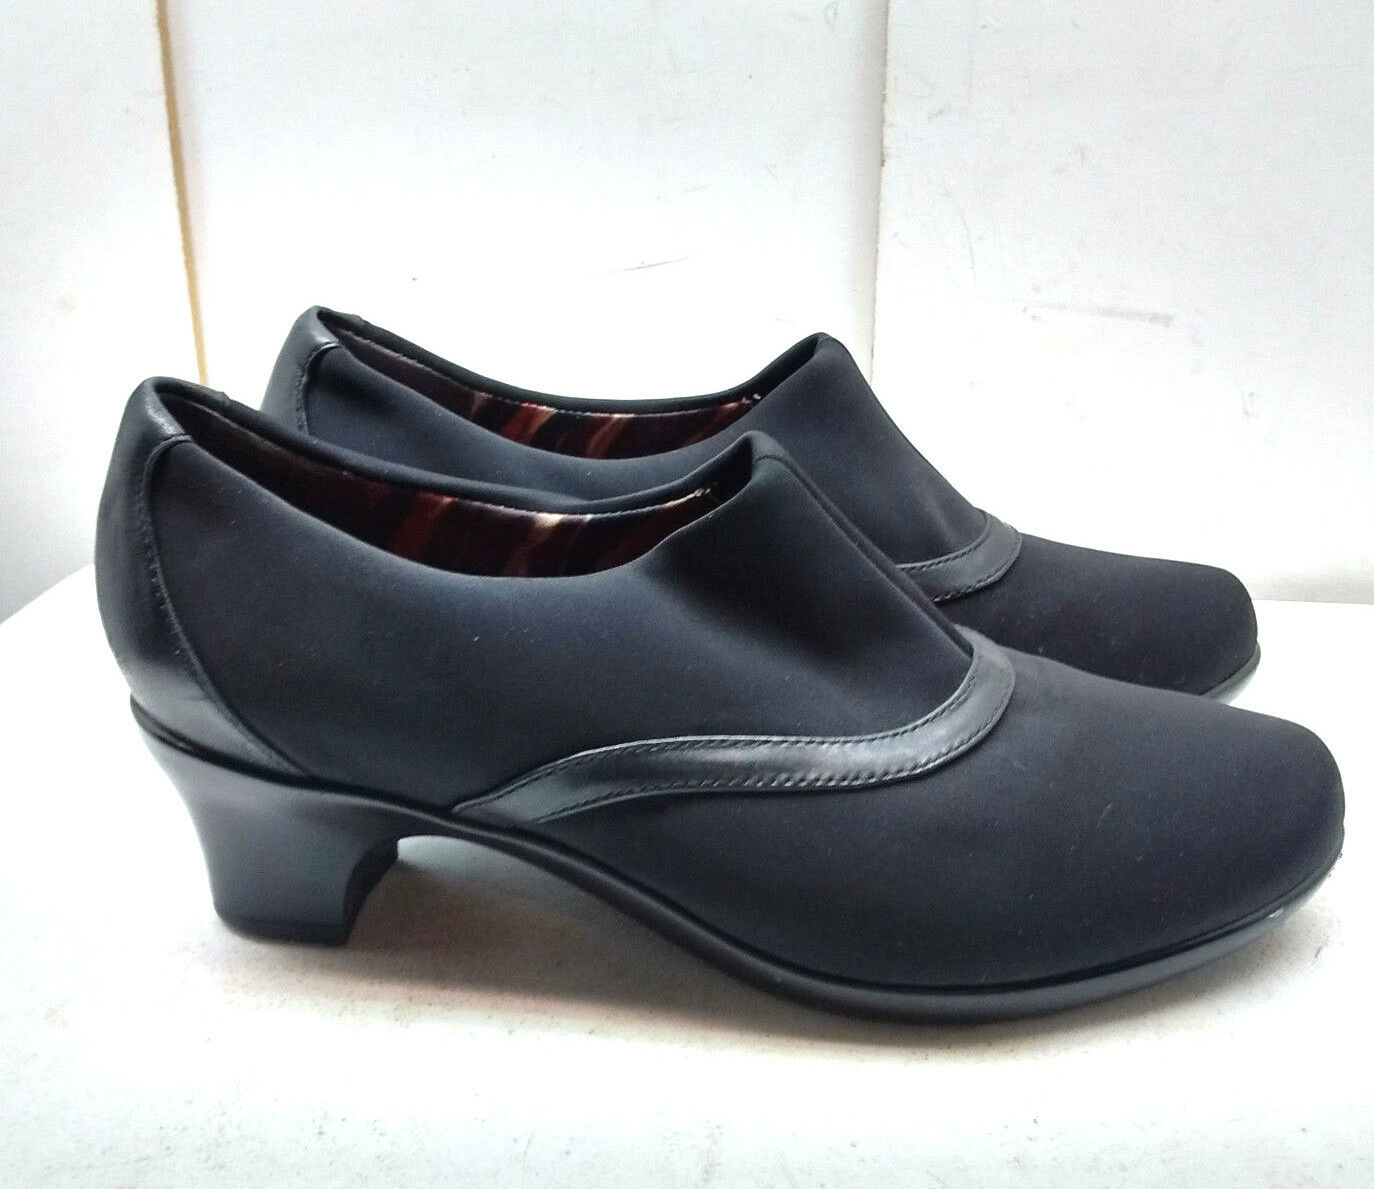 Abeo Judith donna nero Microfiber Slip On Heel Pump avvioie Dress Casual scarpe 7W